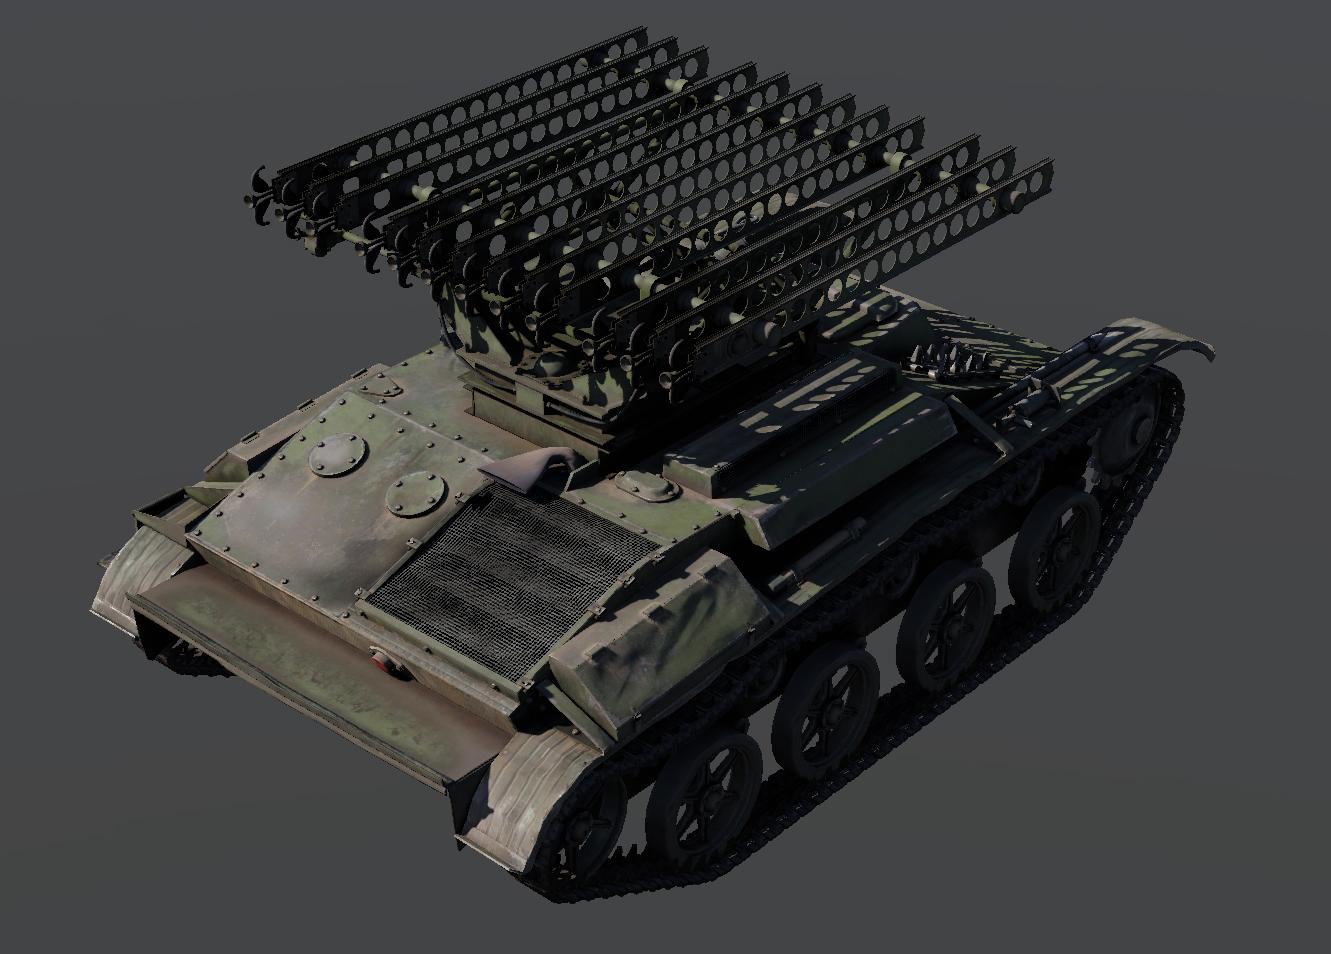 war thunder development b 8 24 the armored patrol. Black Bedroom Furniture Sets. Home Design Ideas